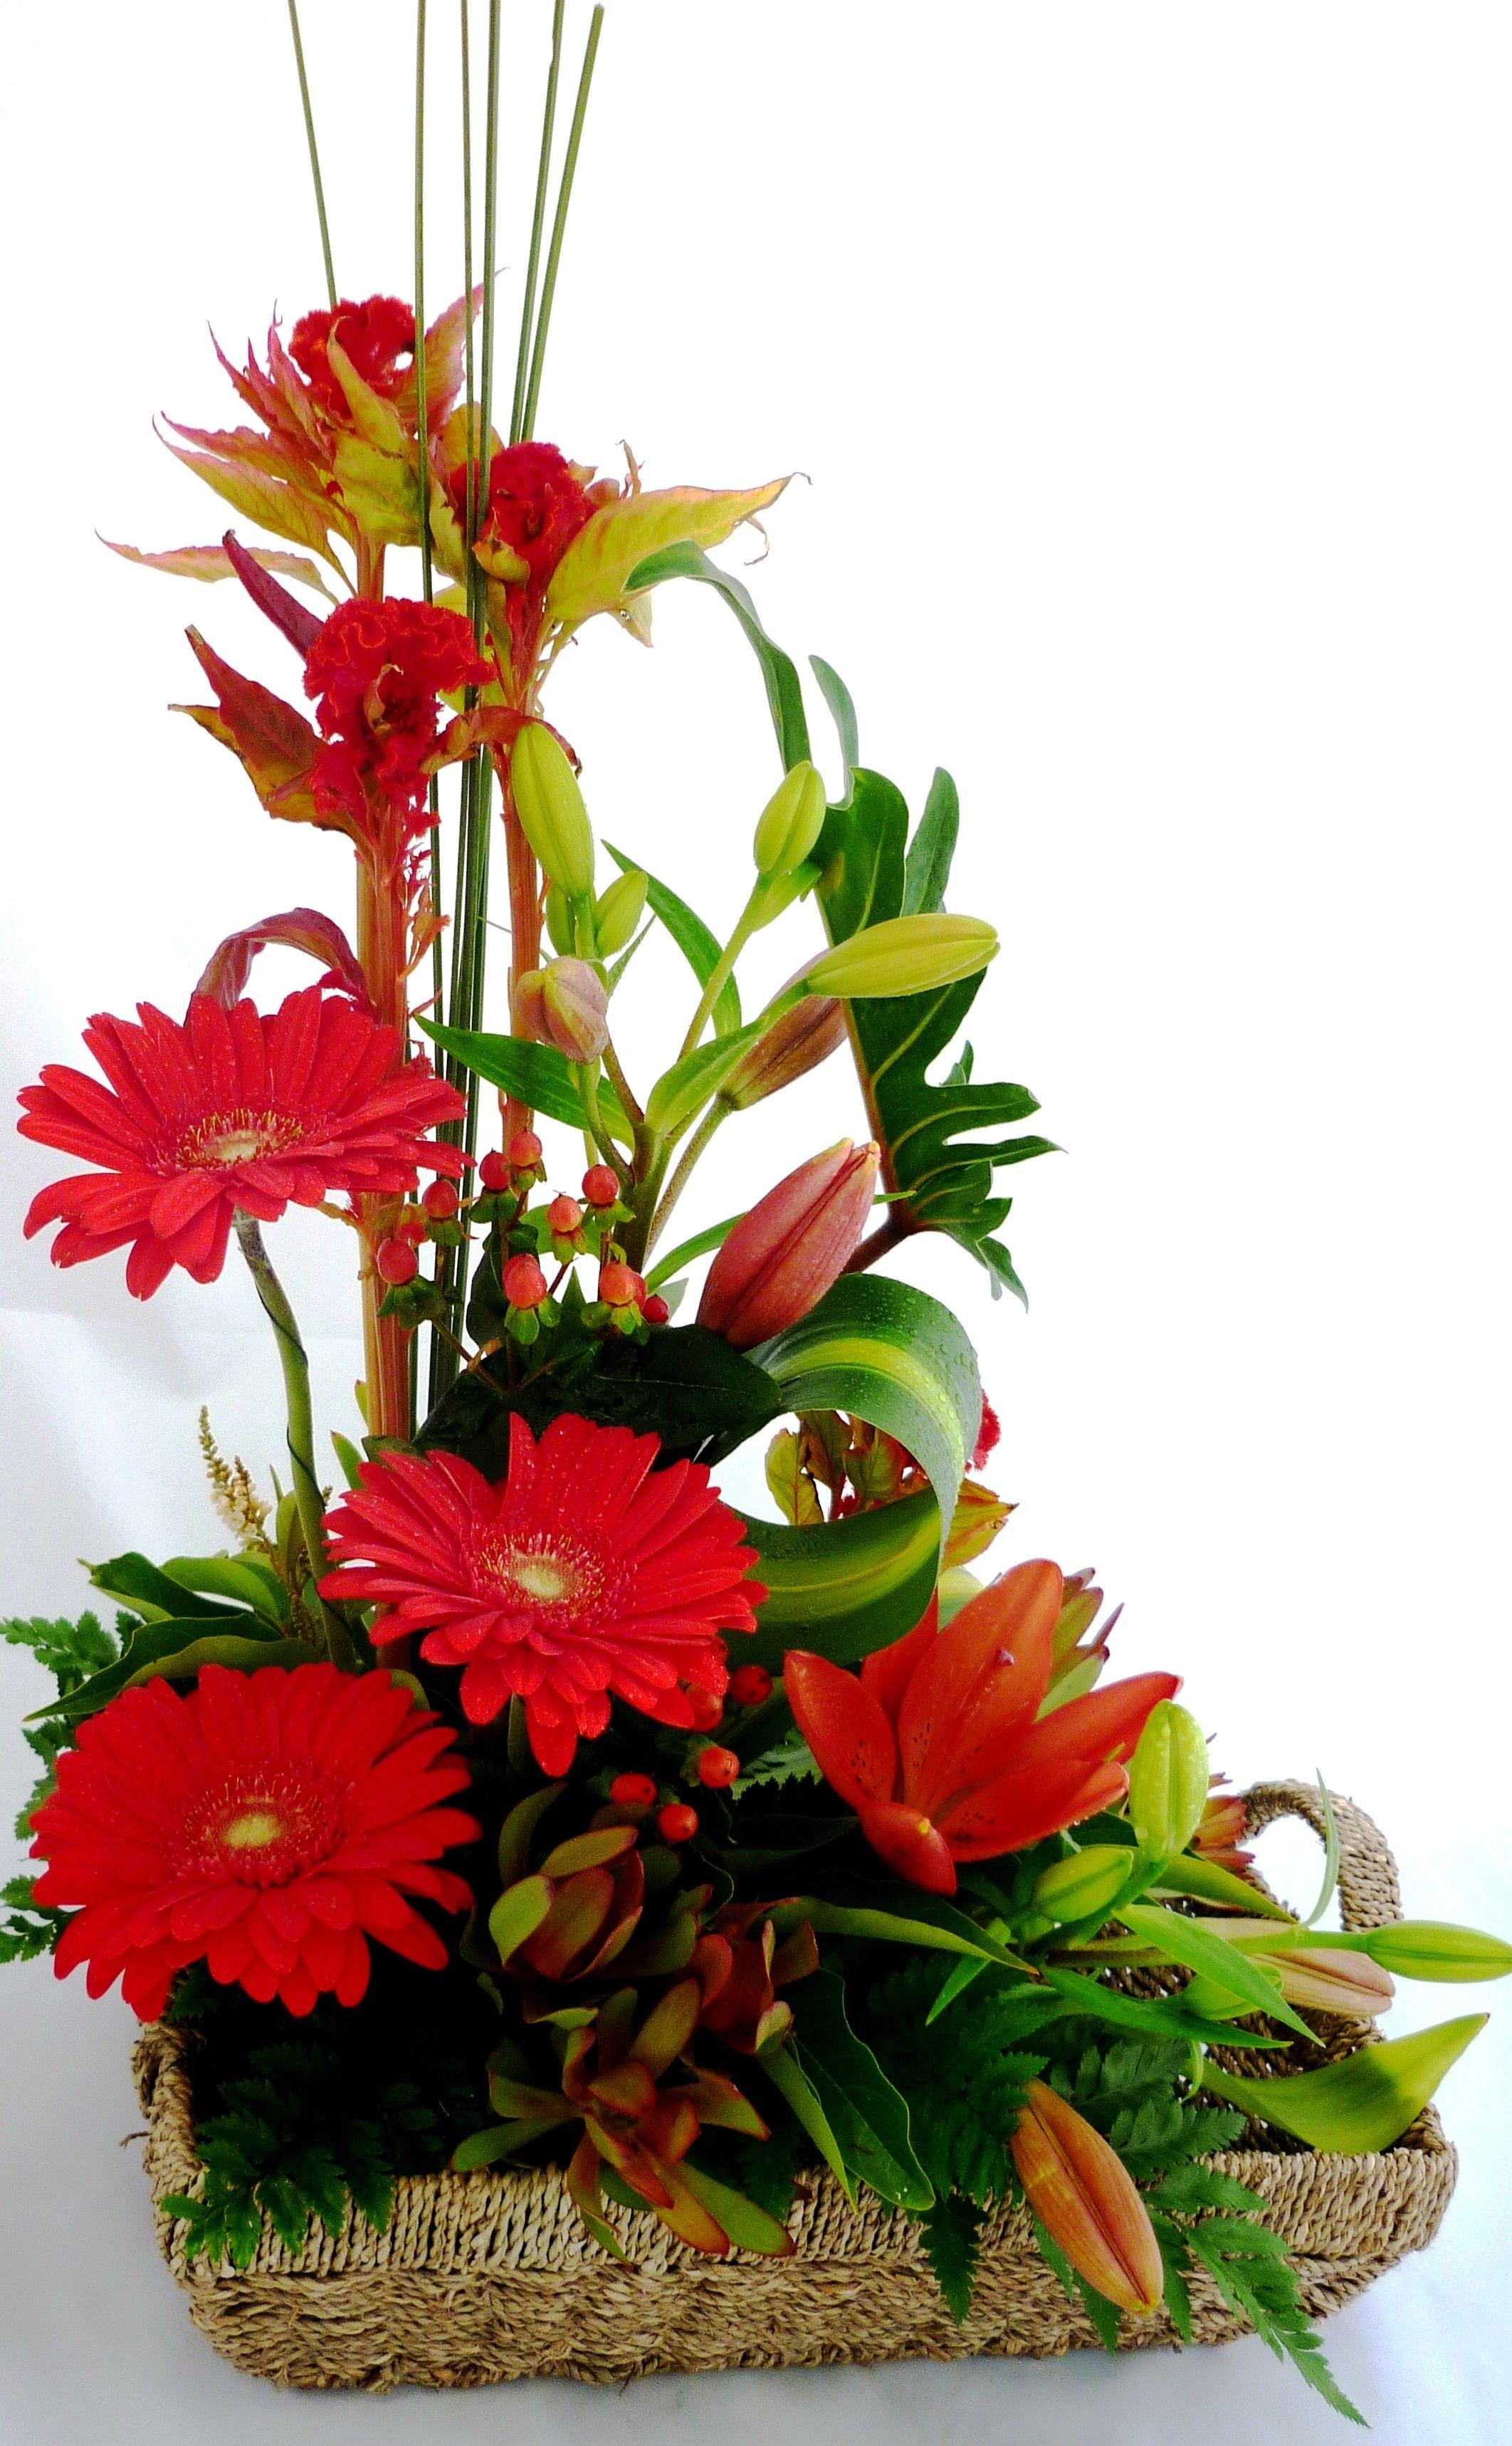 Flower Arrangements Gift Baskets : Floral arrangments home gt gift baskets flower